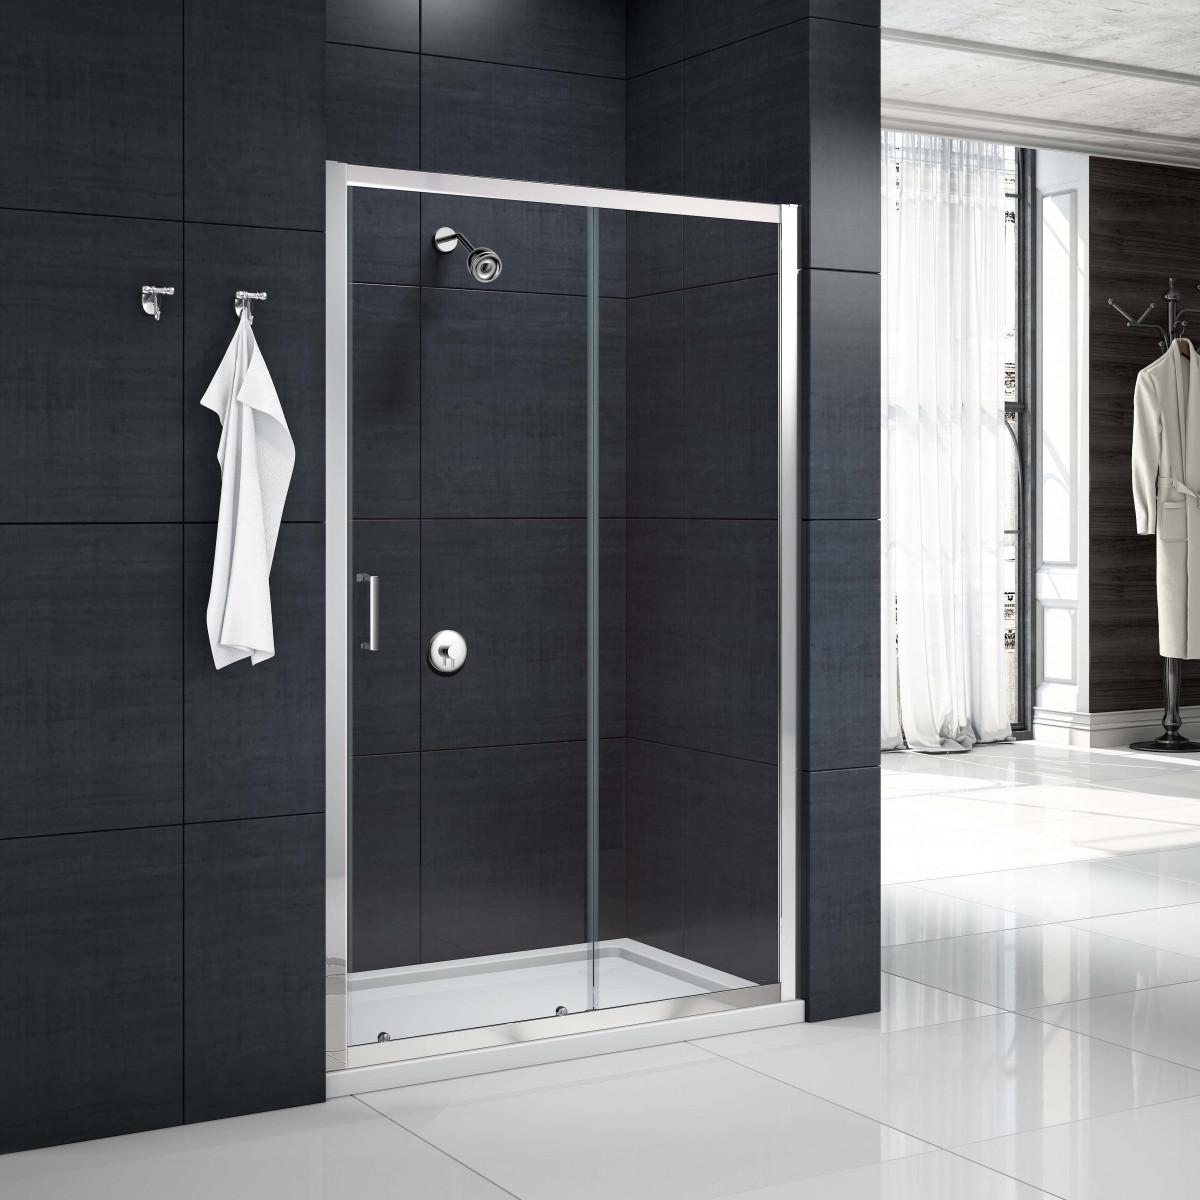 Merlyn mbox sliding shower door 1000mm mbs1000 for 1000mm sliding shower door